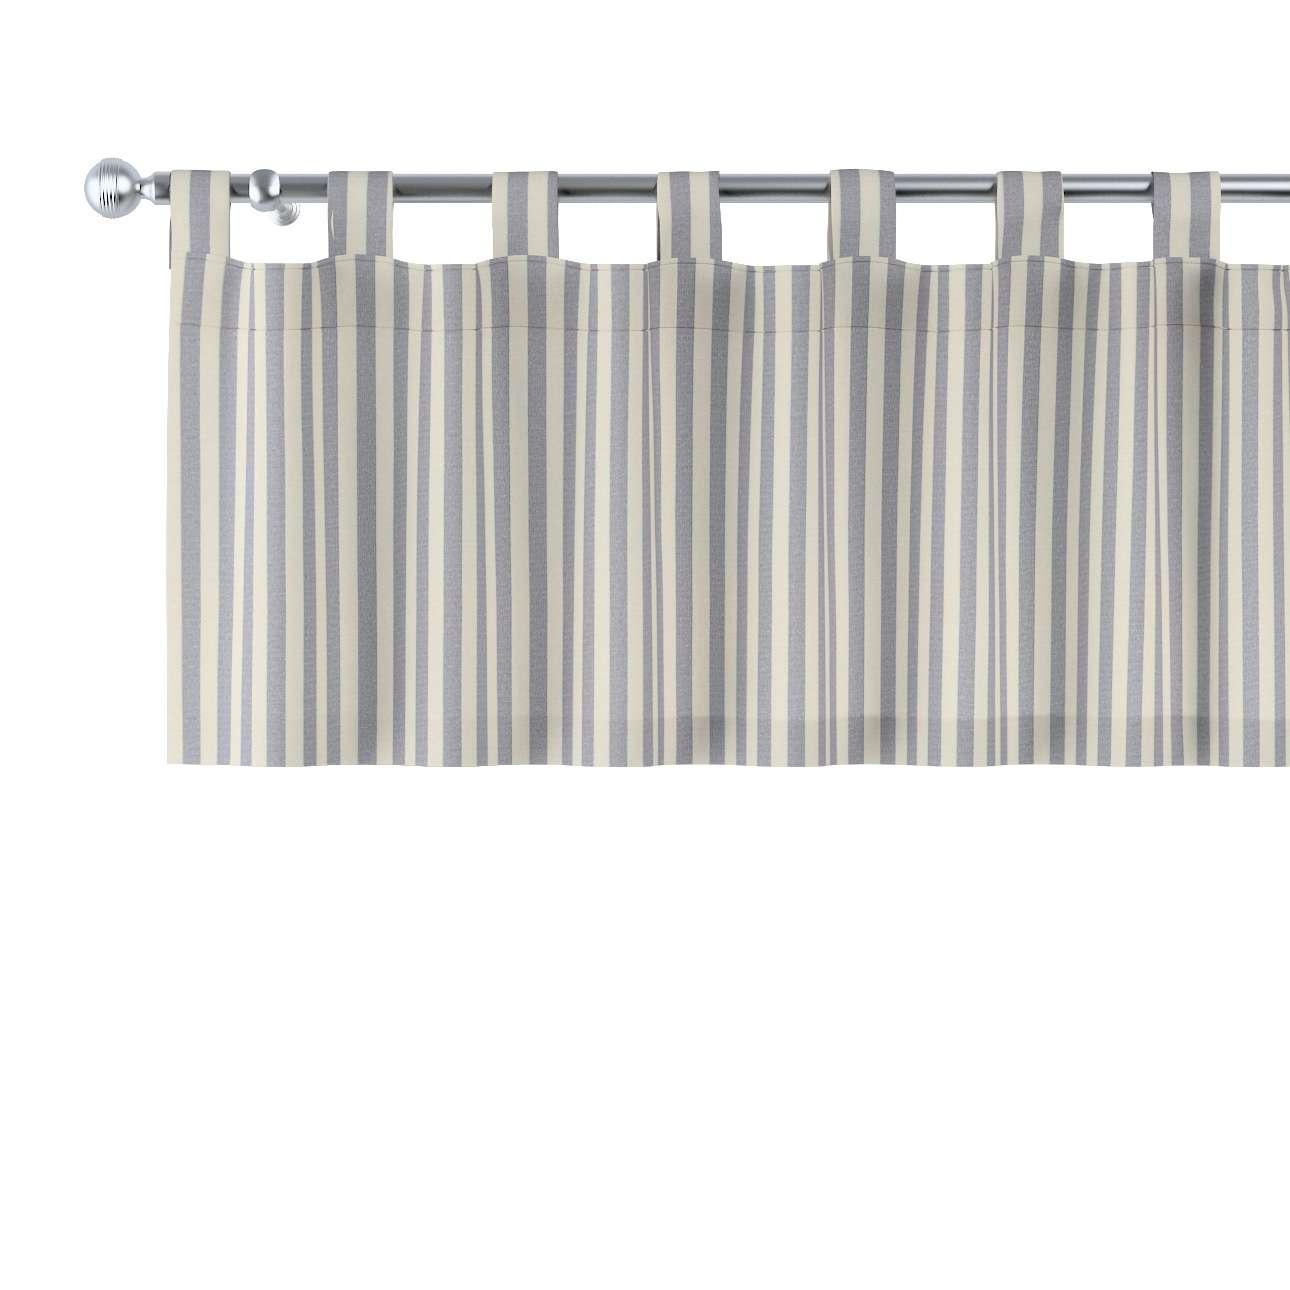 Lambrekin na szelkach 130x40cm w kolekcji Quadro, tkanina: 136-02